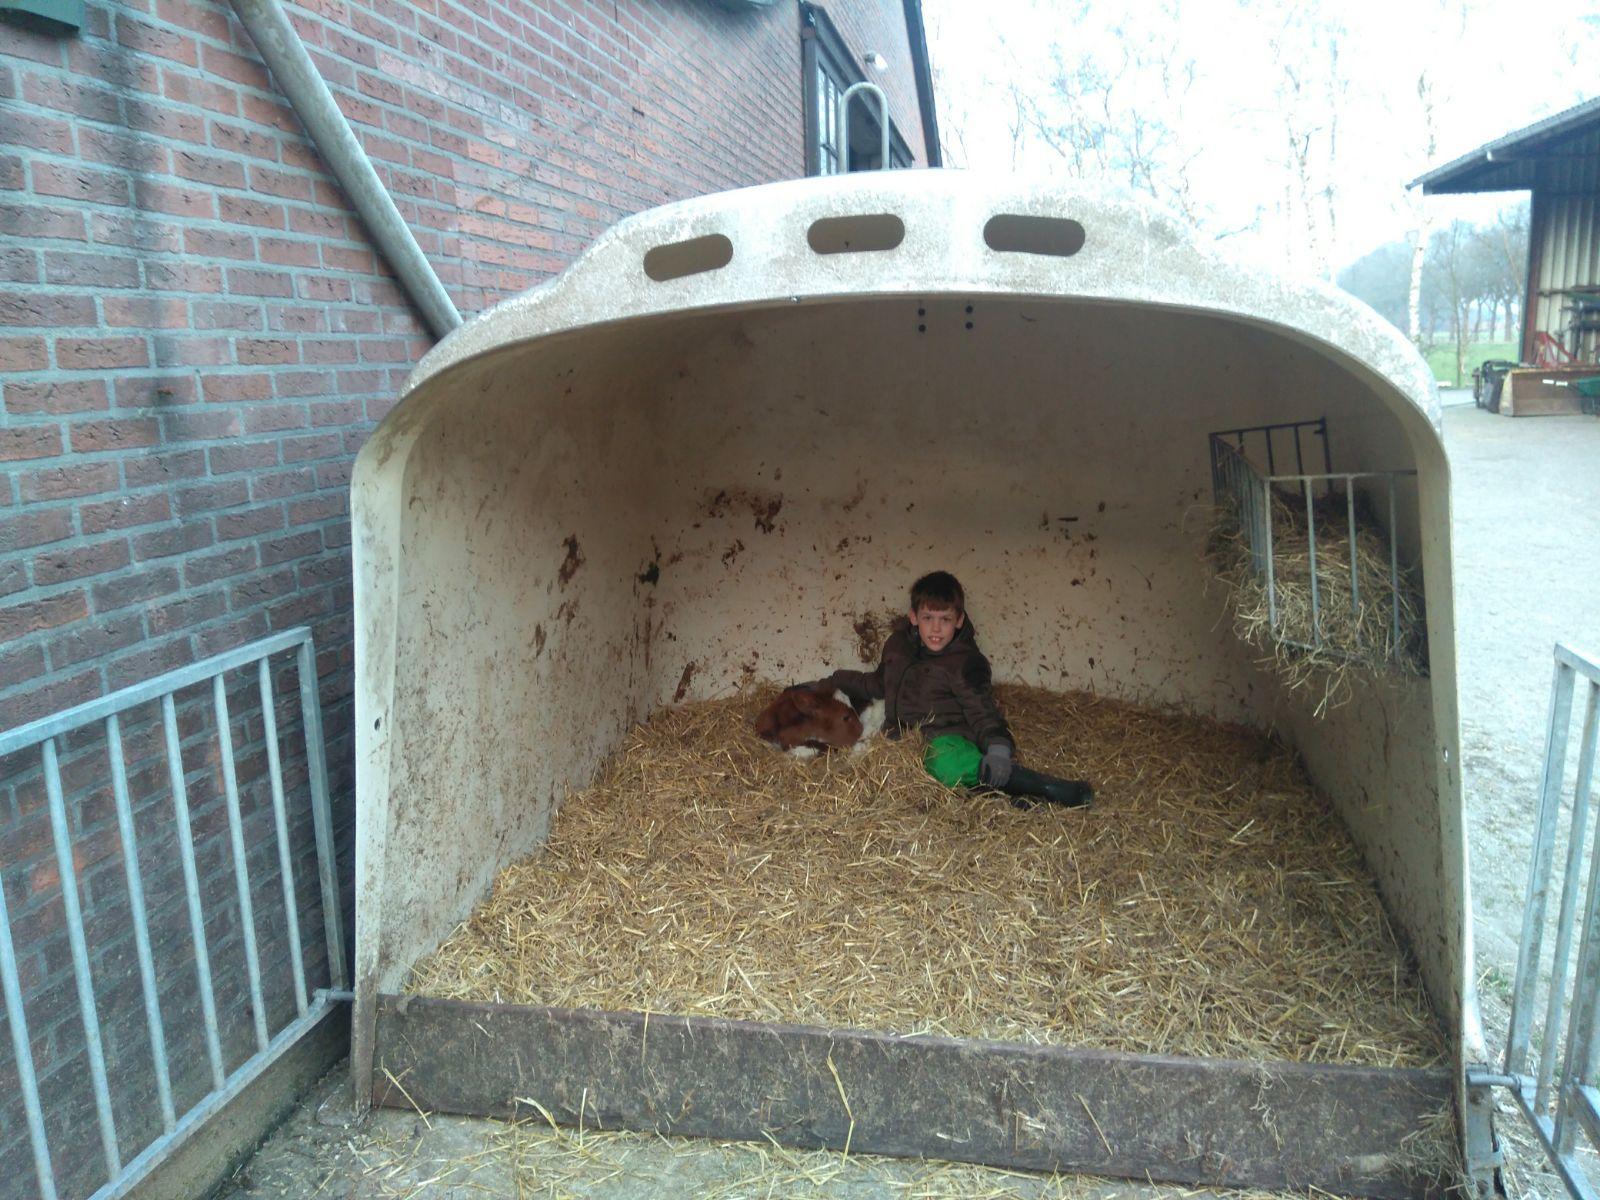 Daniella Boerkamp - Kalfje met Jelle